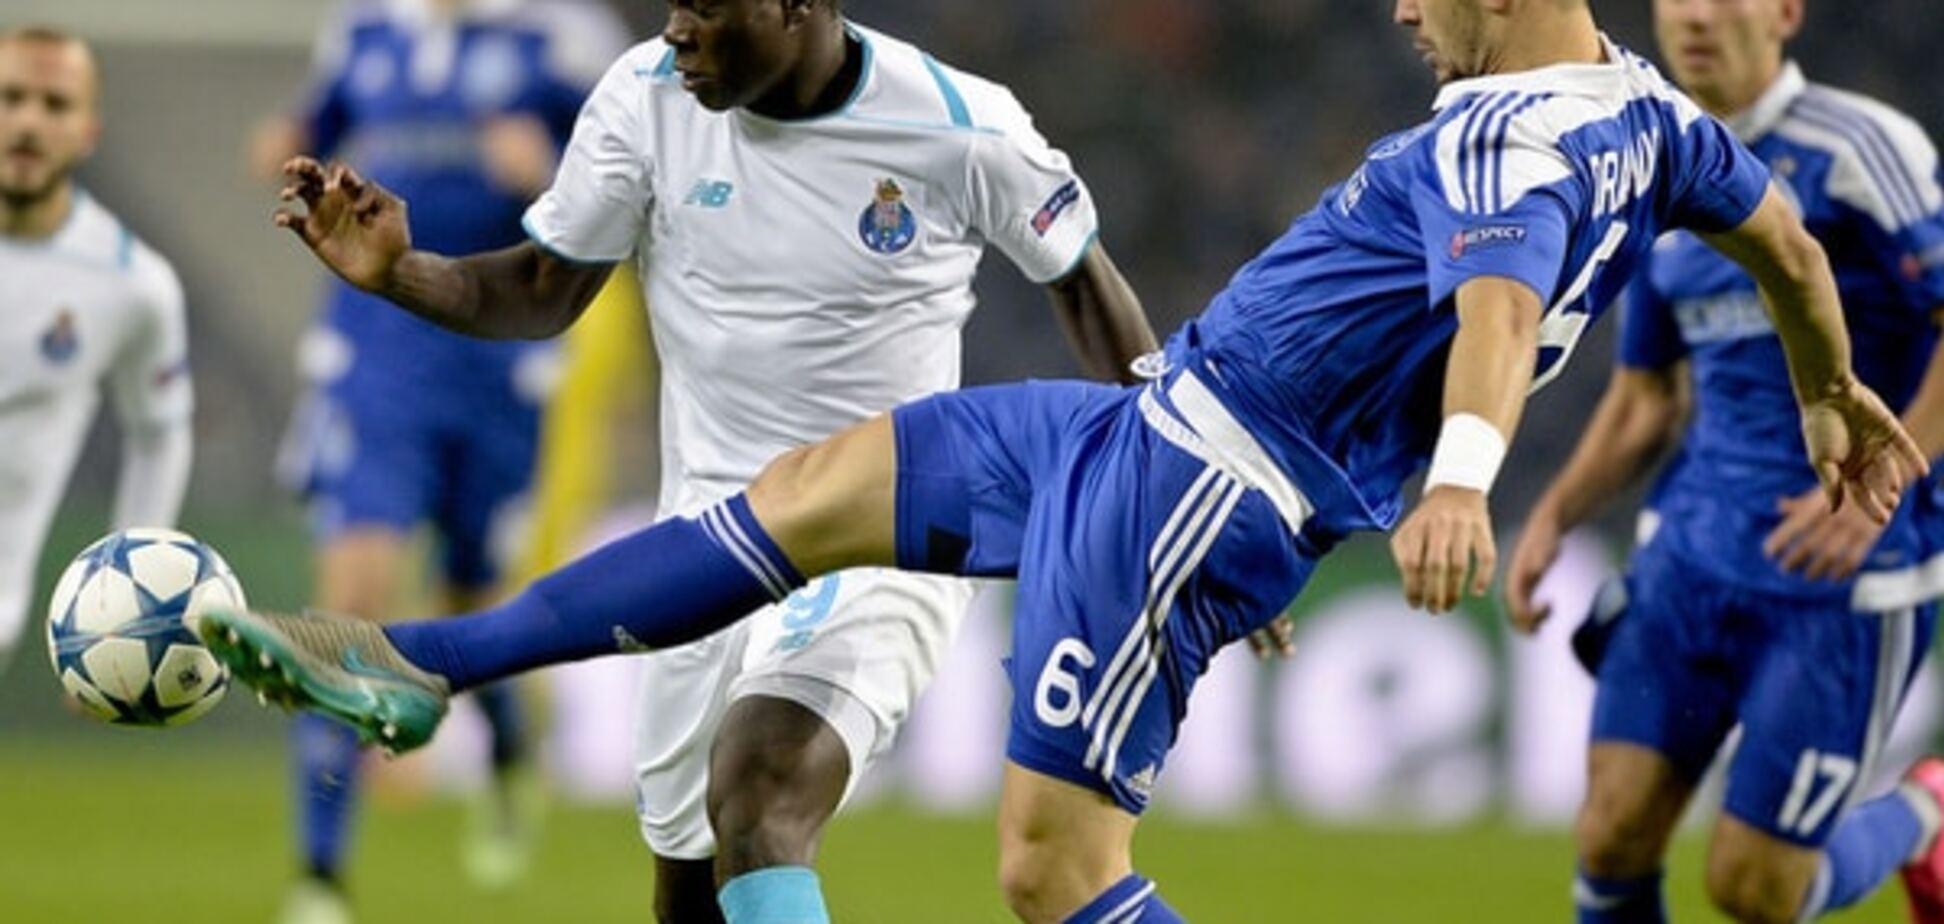 Порту - Динамо - 0-2: видео-обзор матча